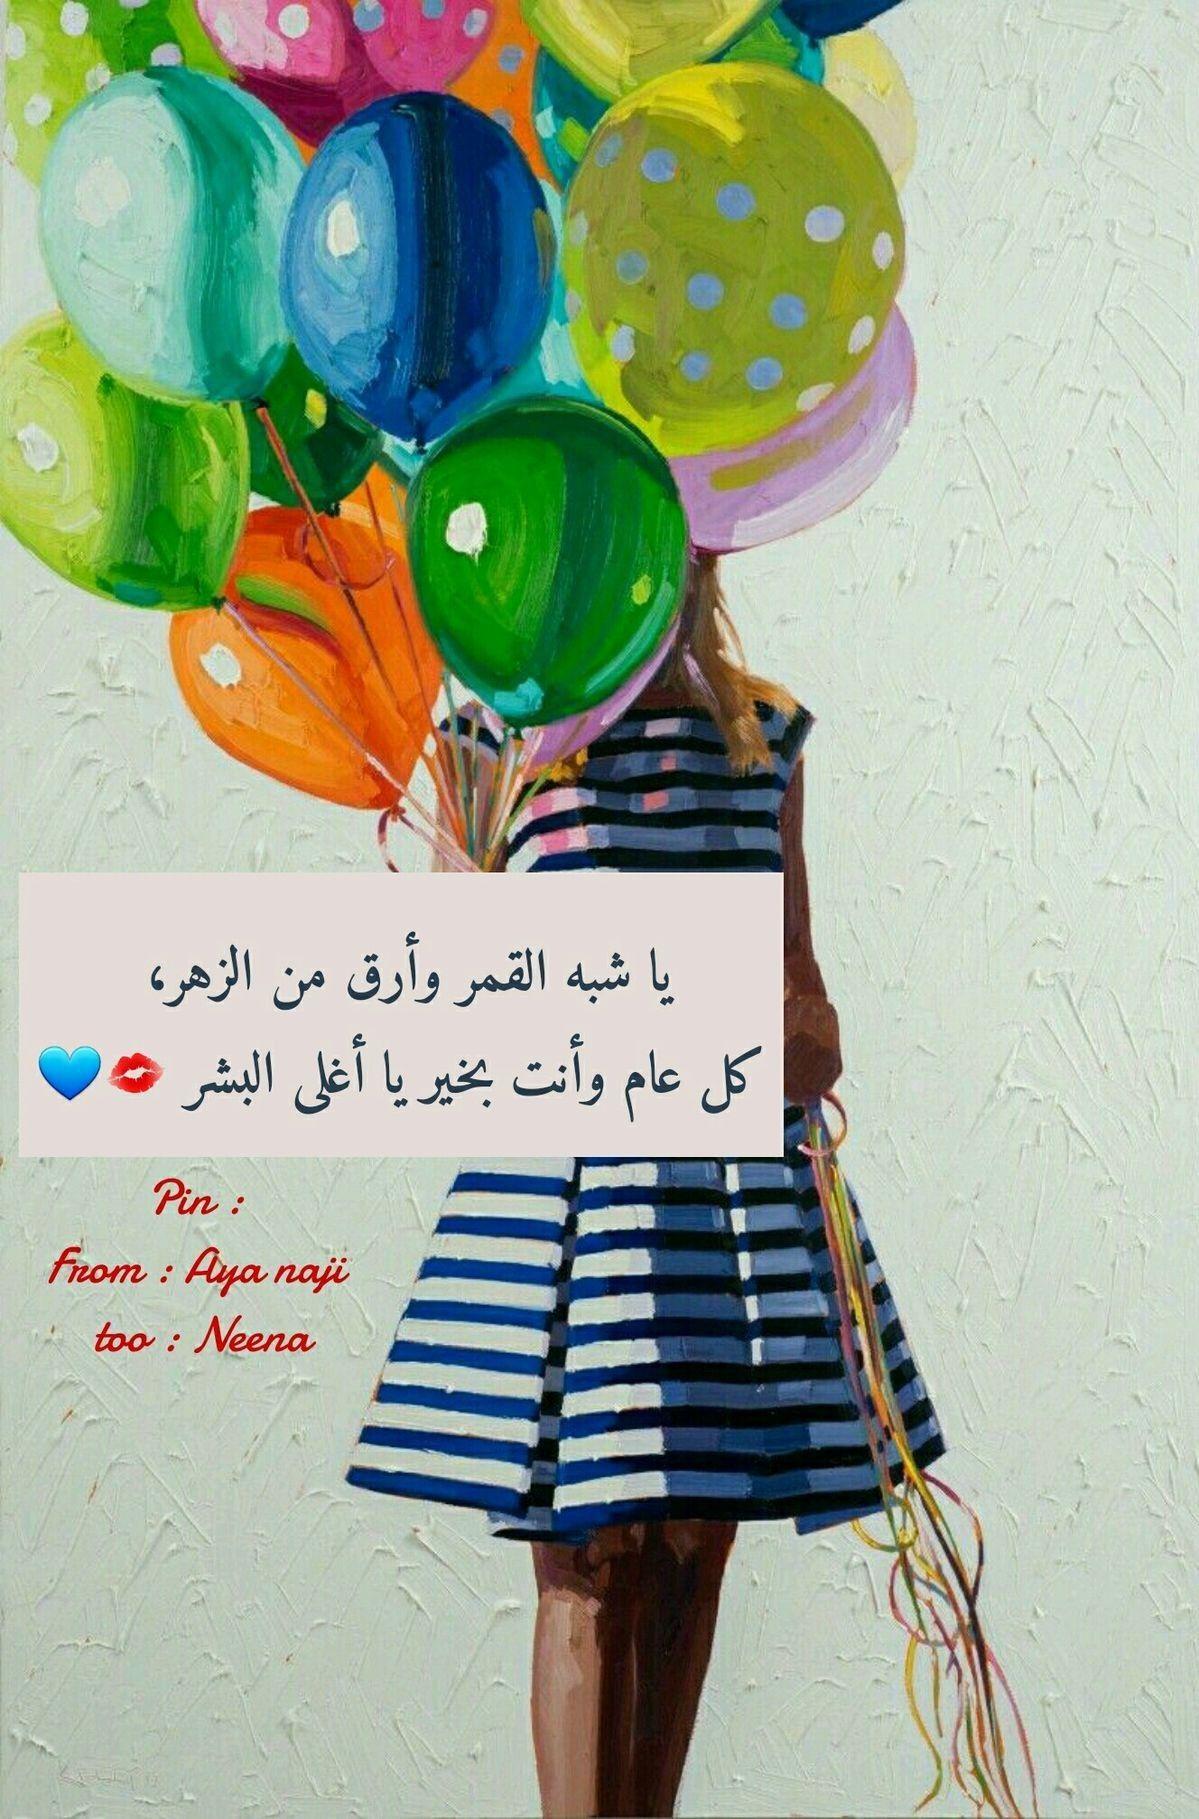 Pin By Lelbachir On أعياد ميلاد Happy Birthday Wishes Cards Birthday Girl Quotes Happy Birthday Husband